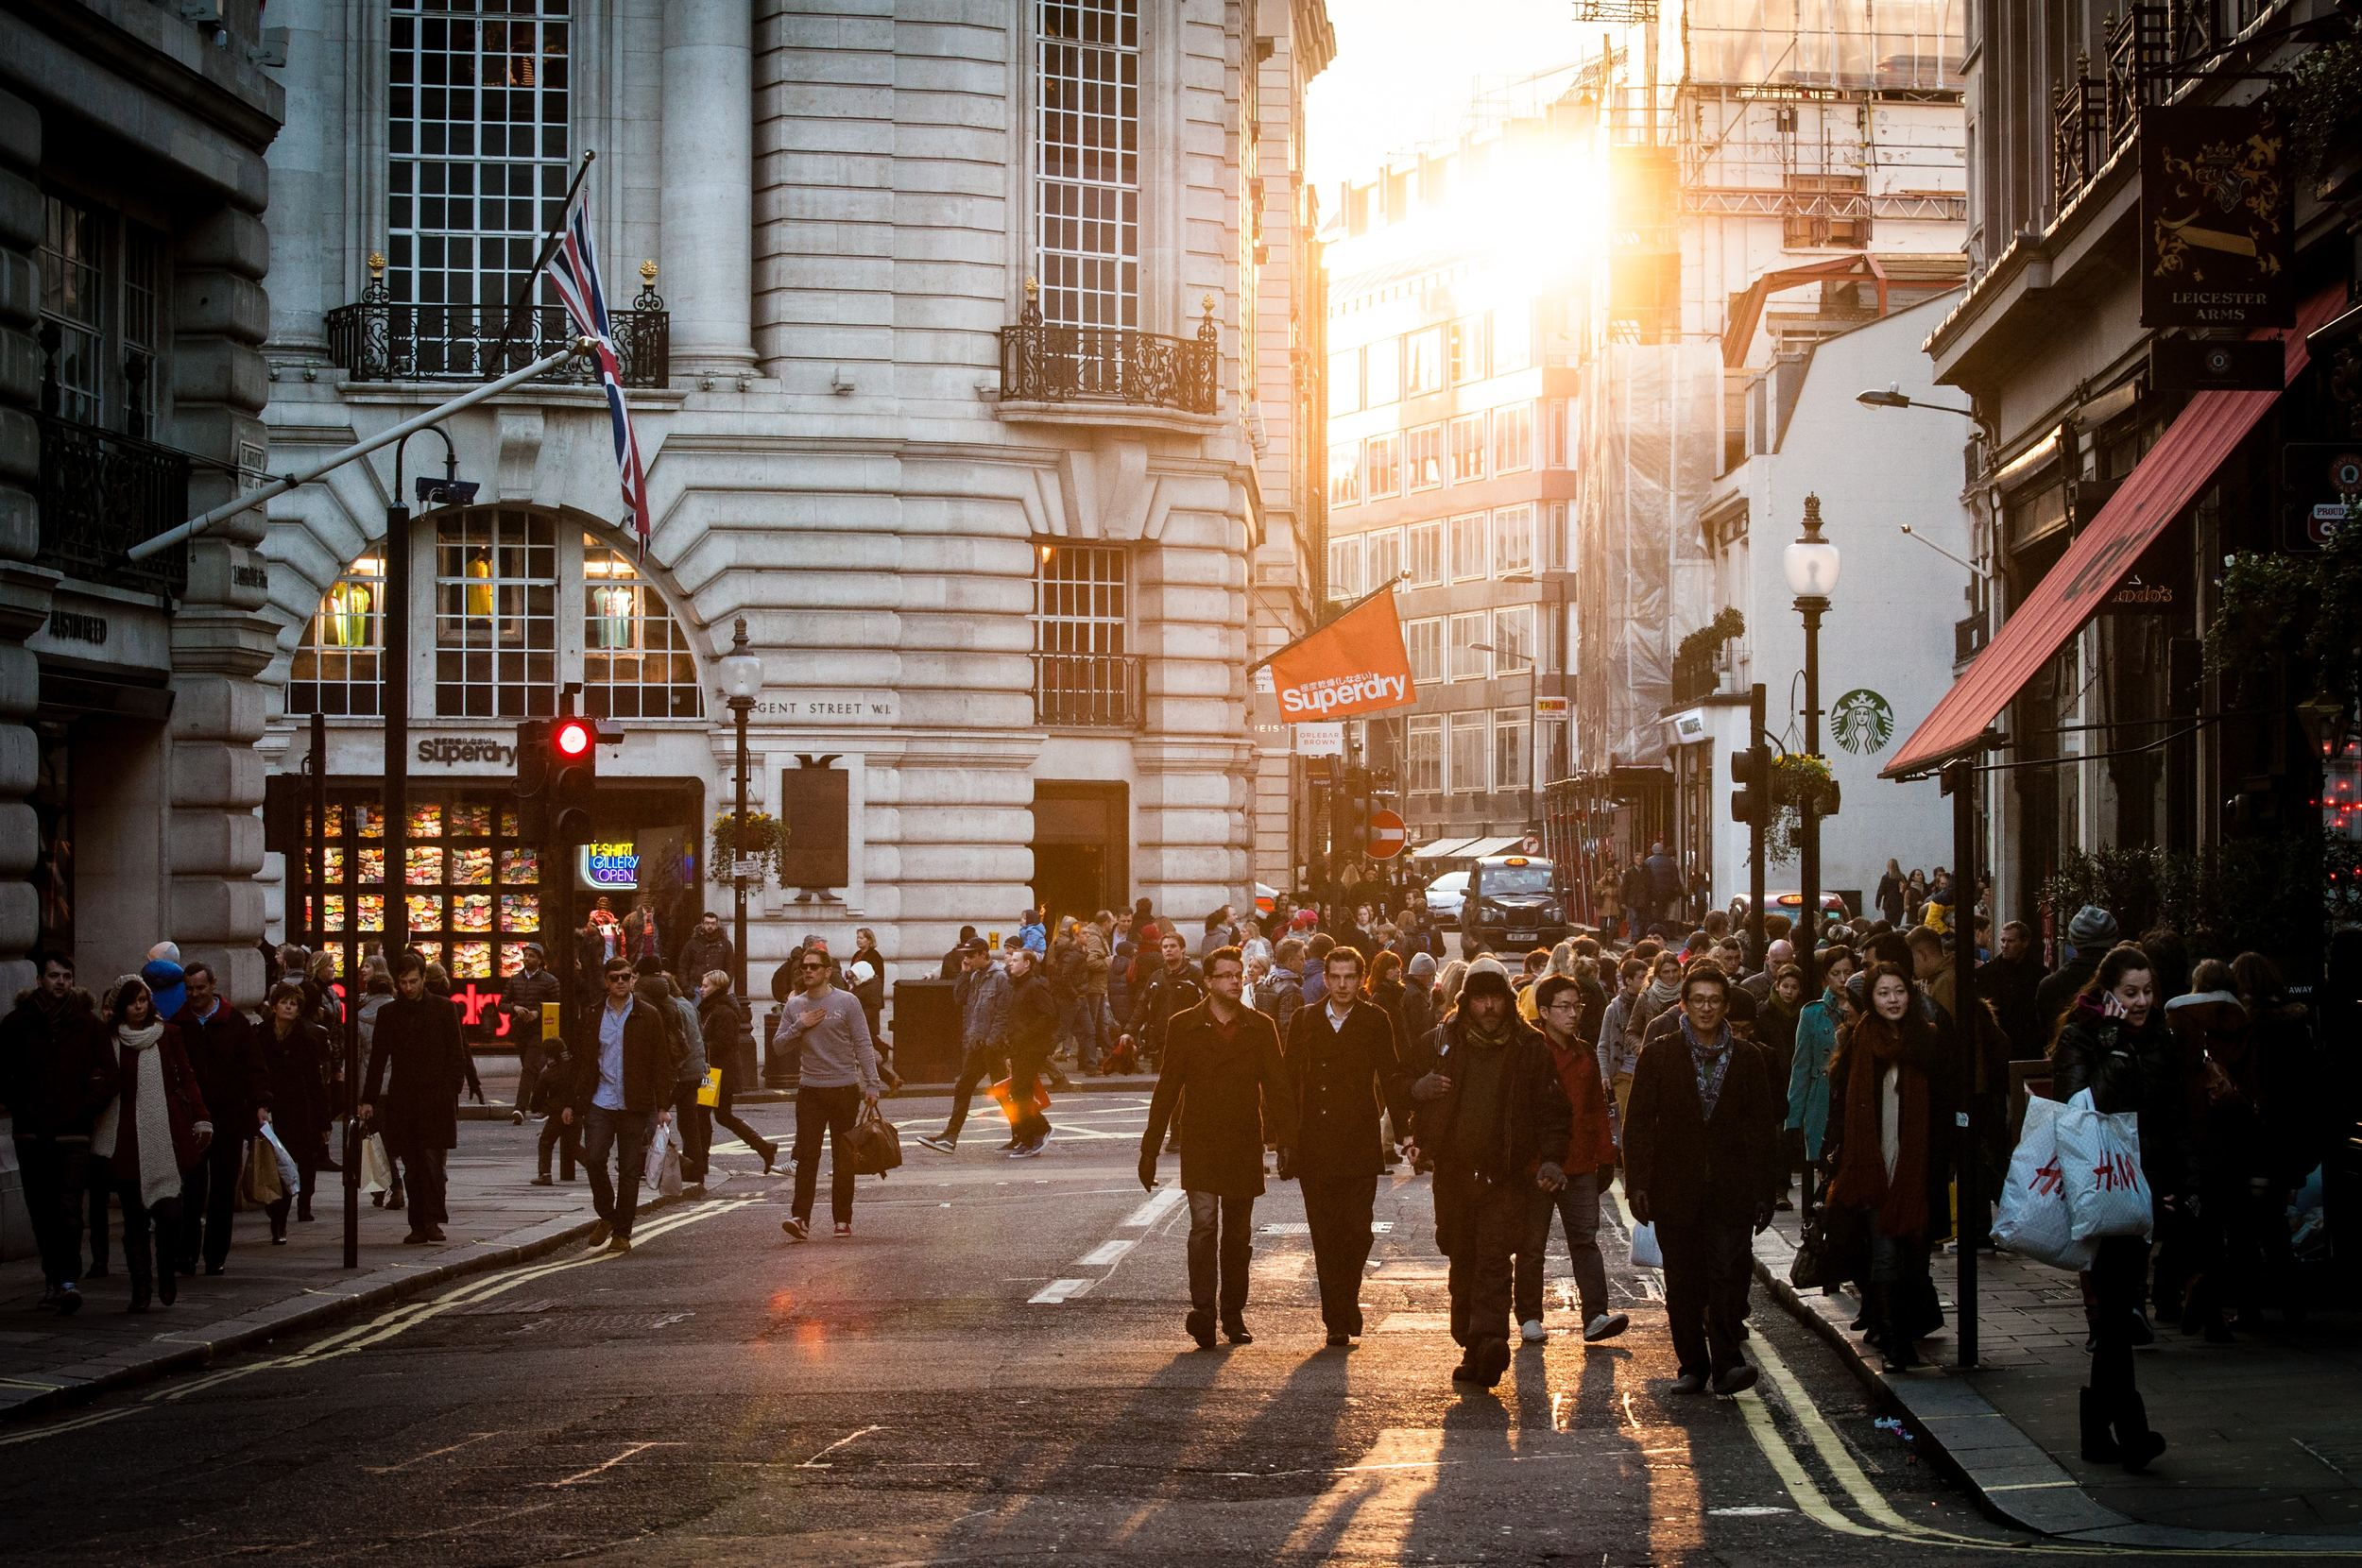 London Shopping - Best London Itinerary